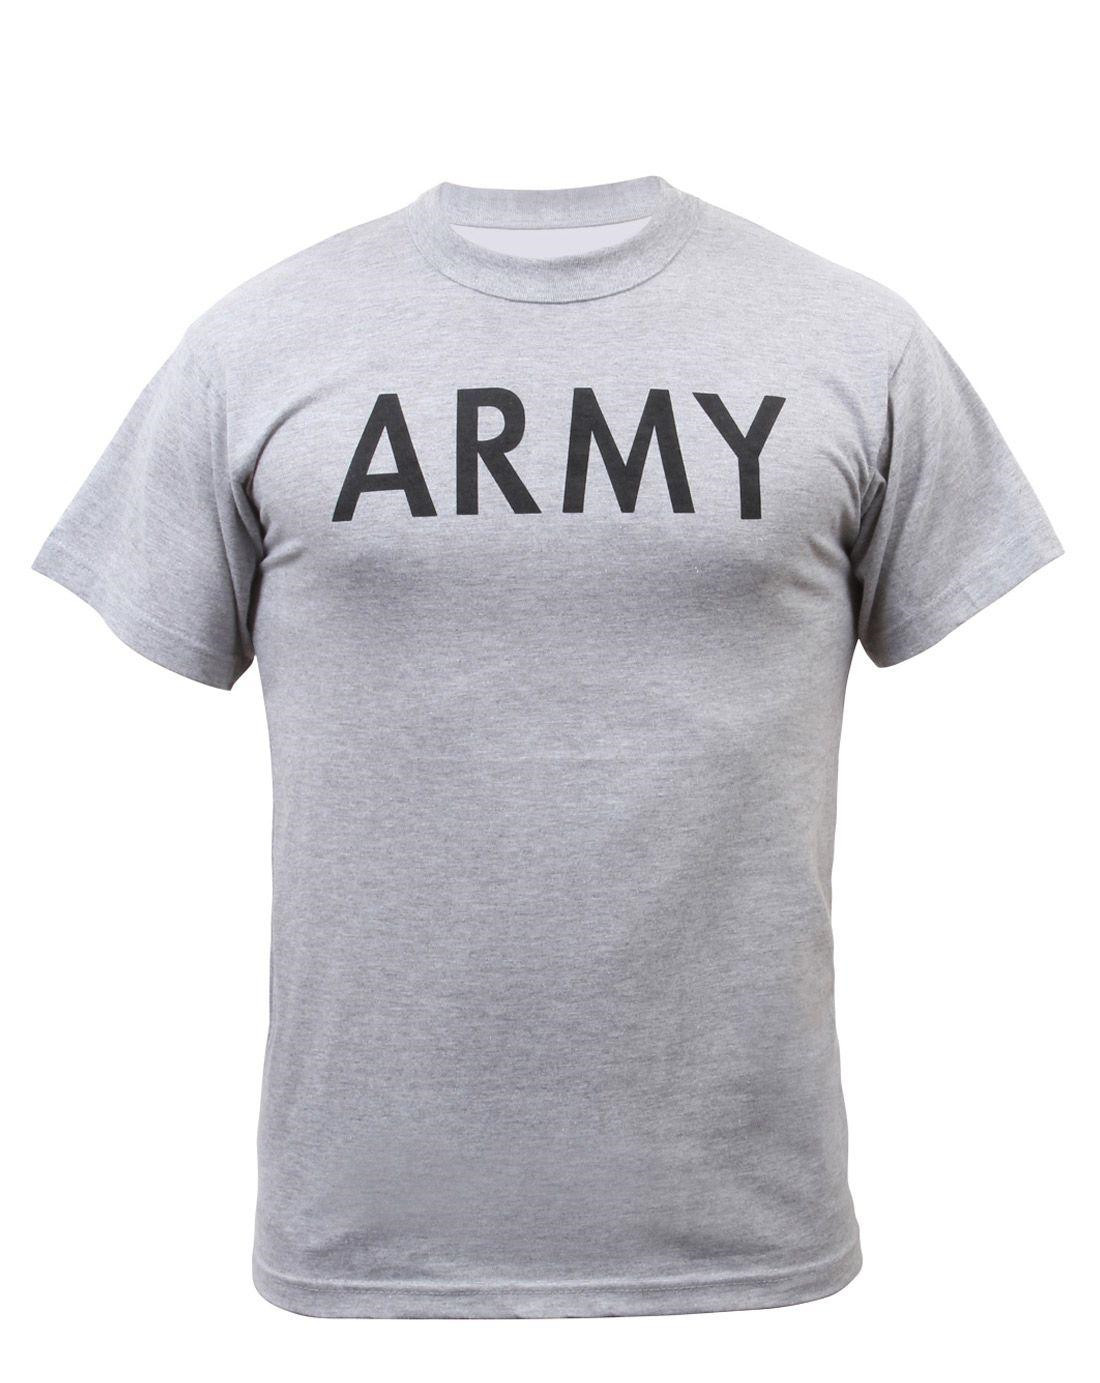 Rothco Kids Army Physical Training T-Shirt